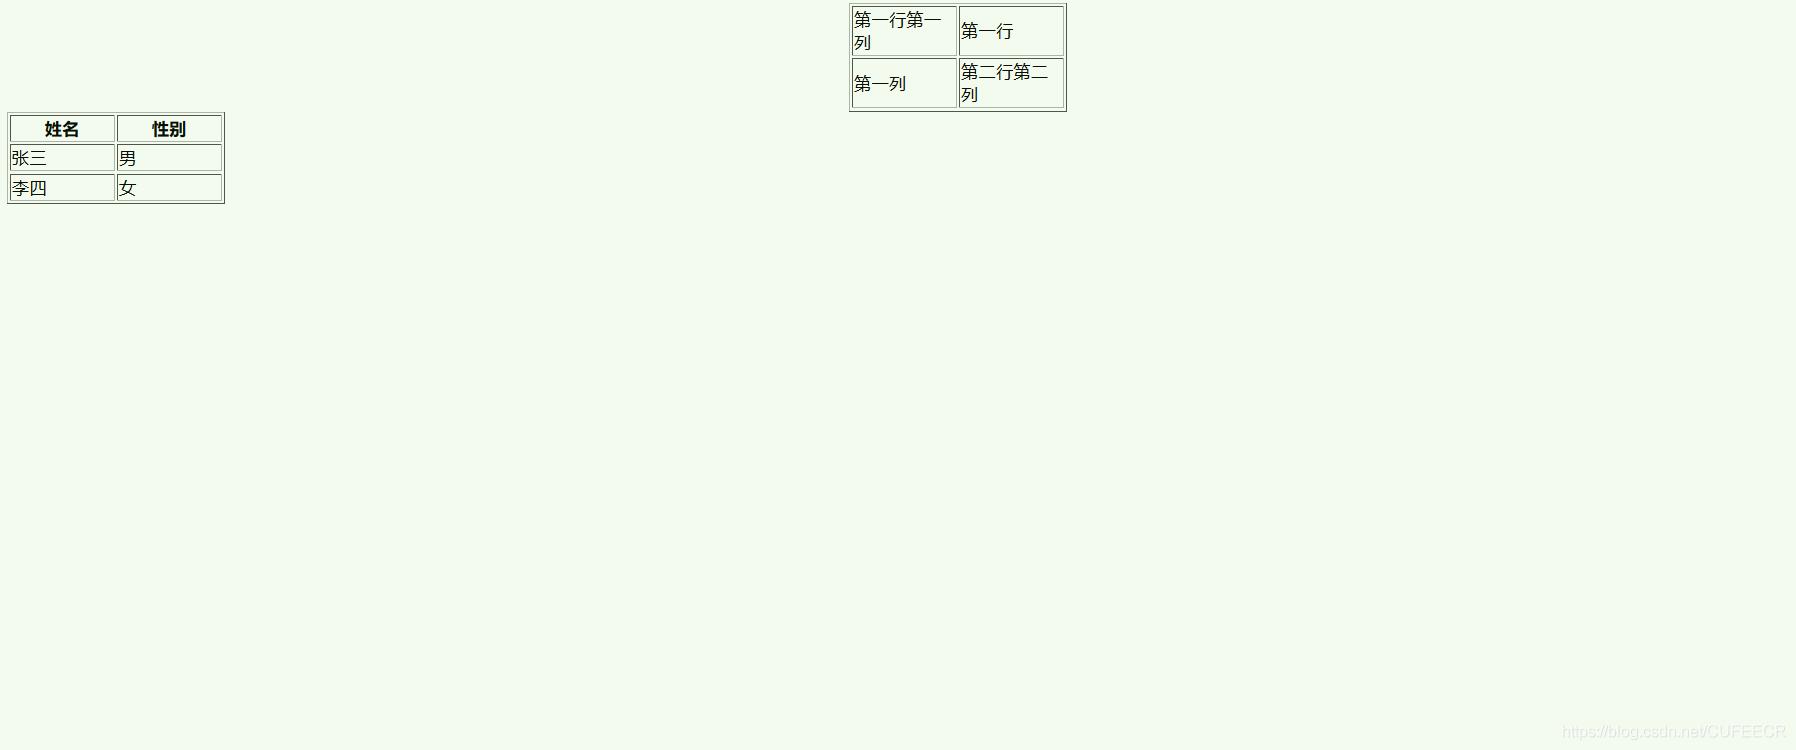 html table border